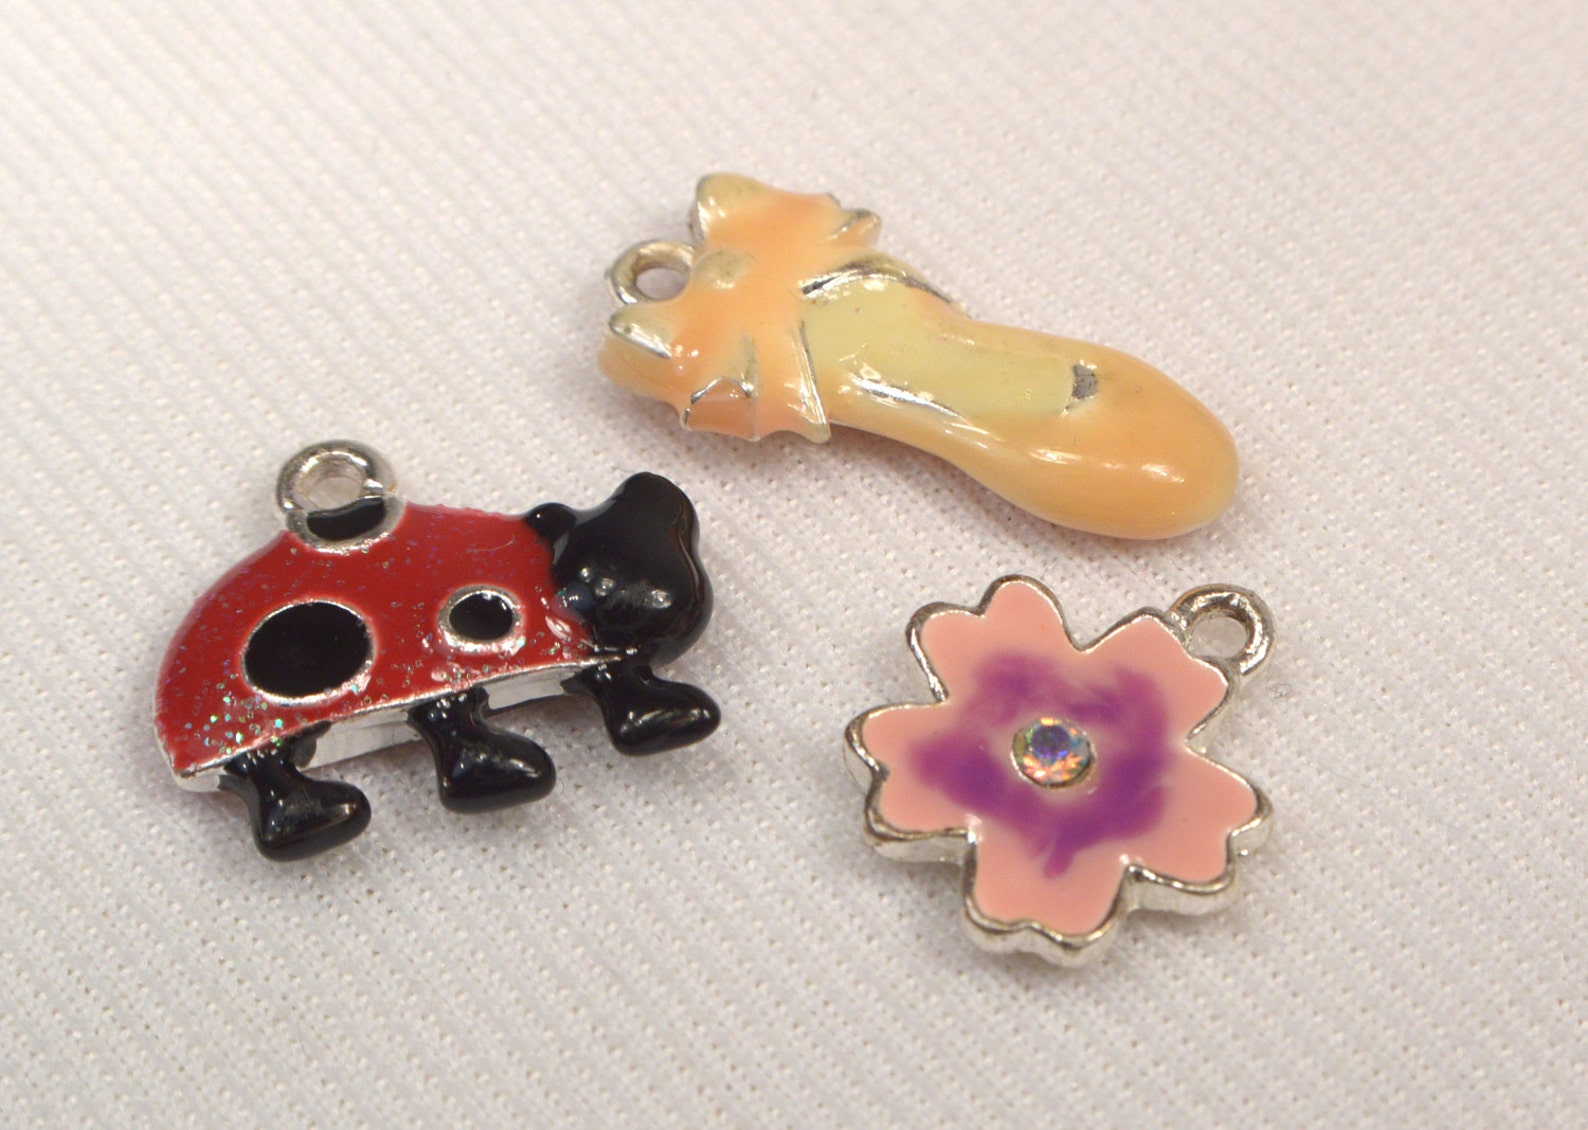 lady bug charm, ballet shoe charm, flower metal charm mix, charms for jewelry making, destash metal vintage charms, 3 loose char